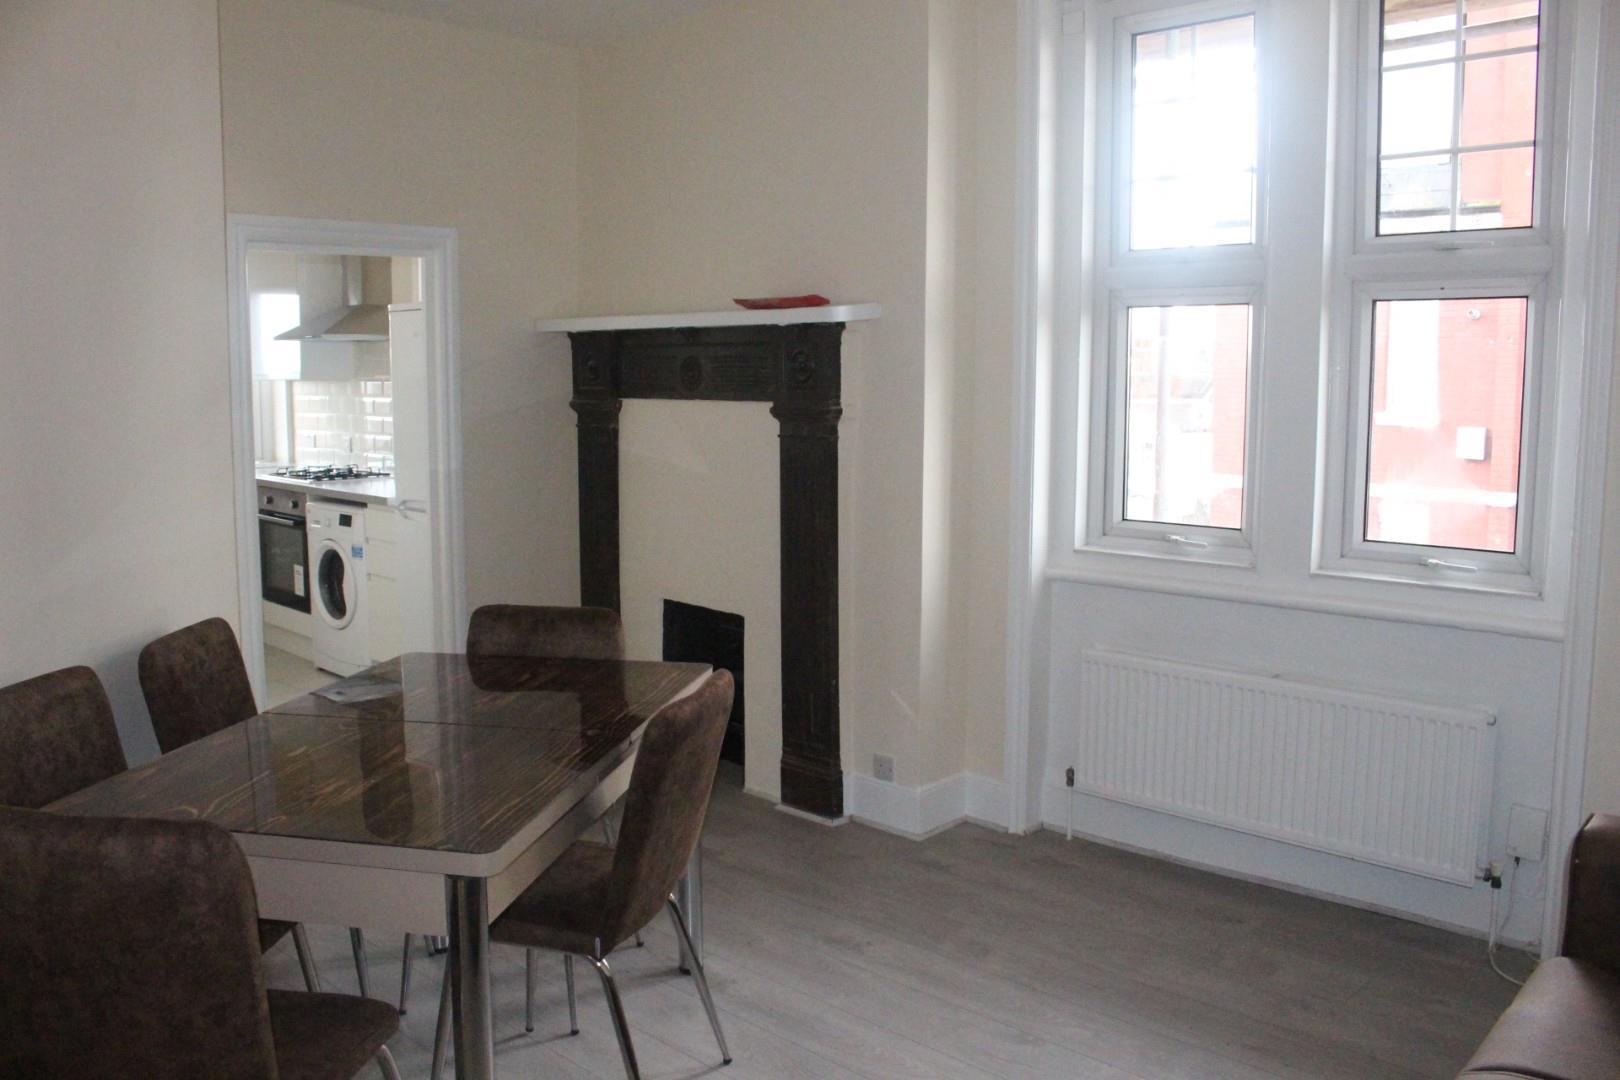 3 Bedroom Brand New Flat For Rent in Haringey